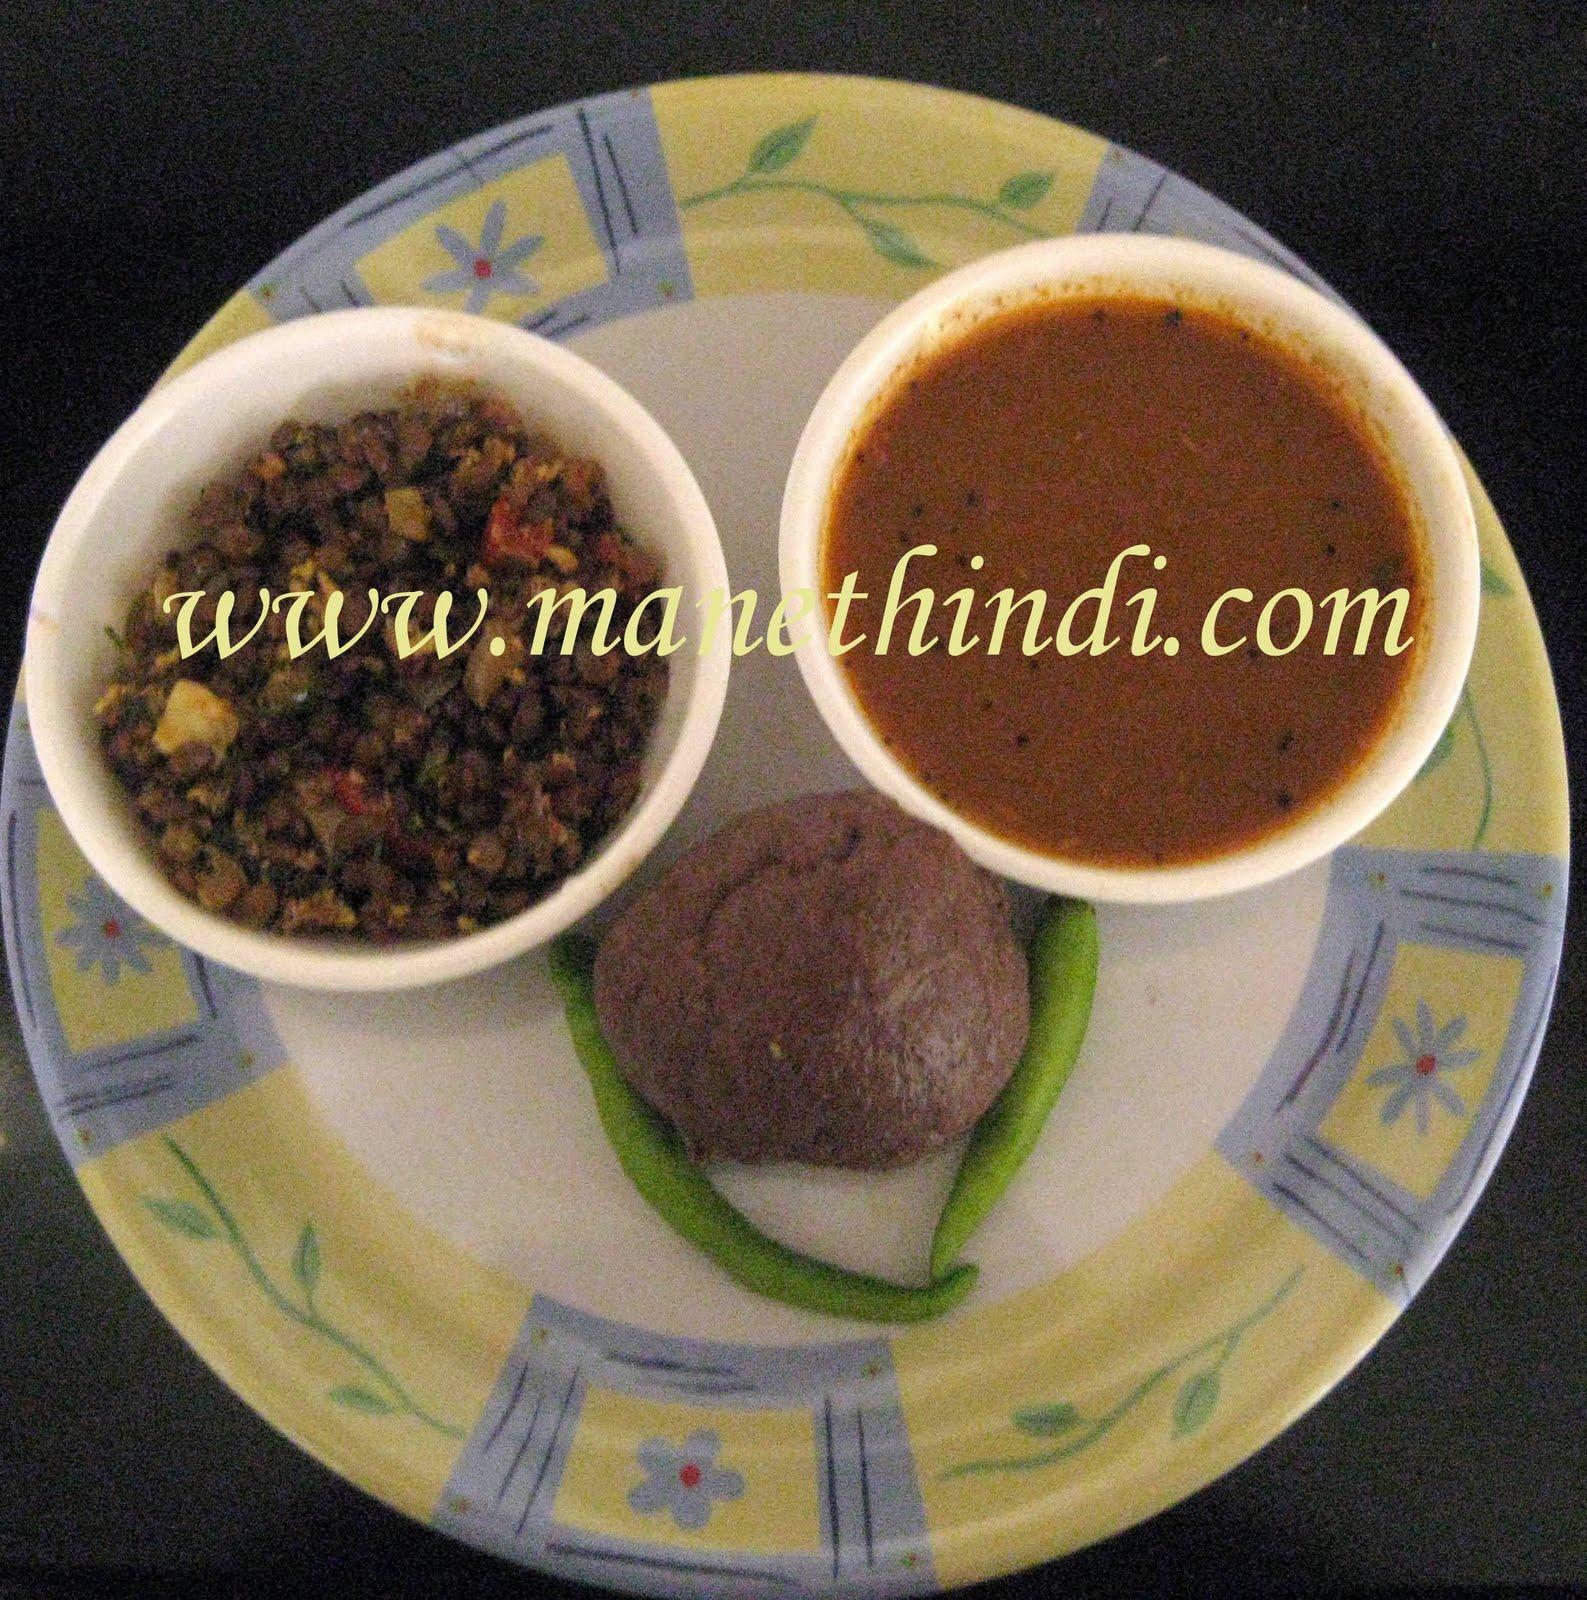 keto diet meaning in kannada